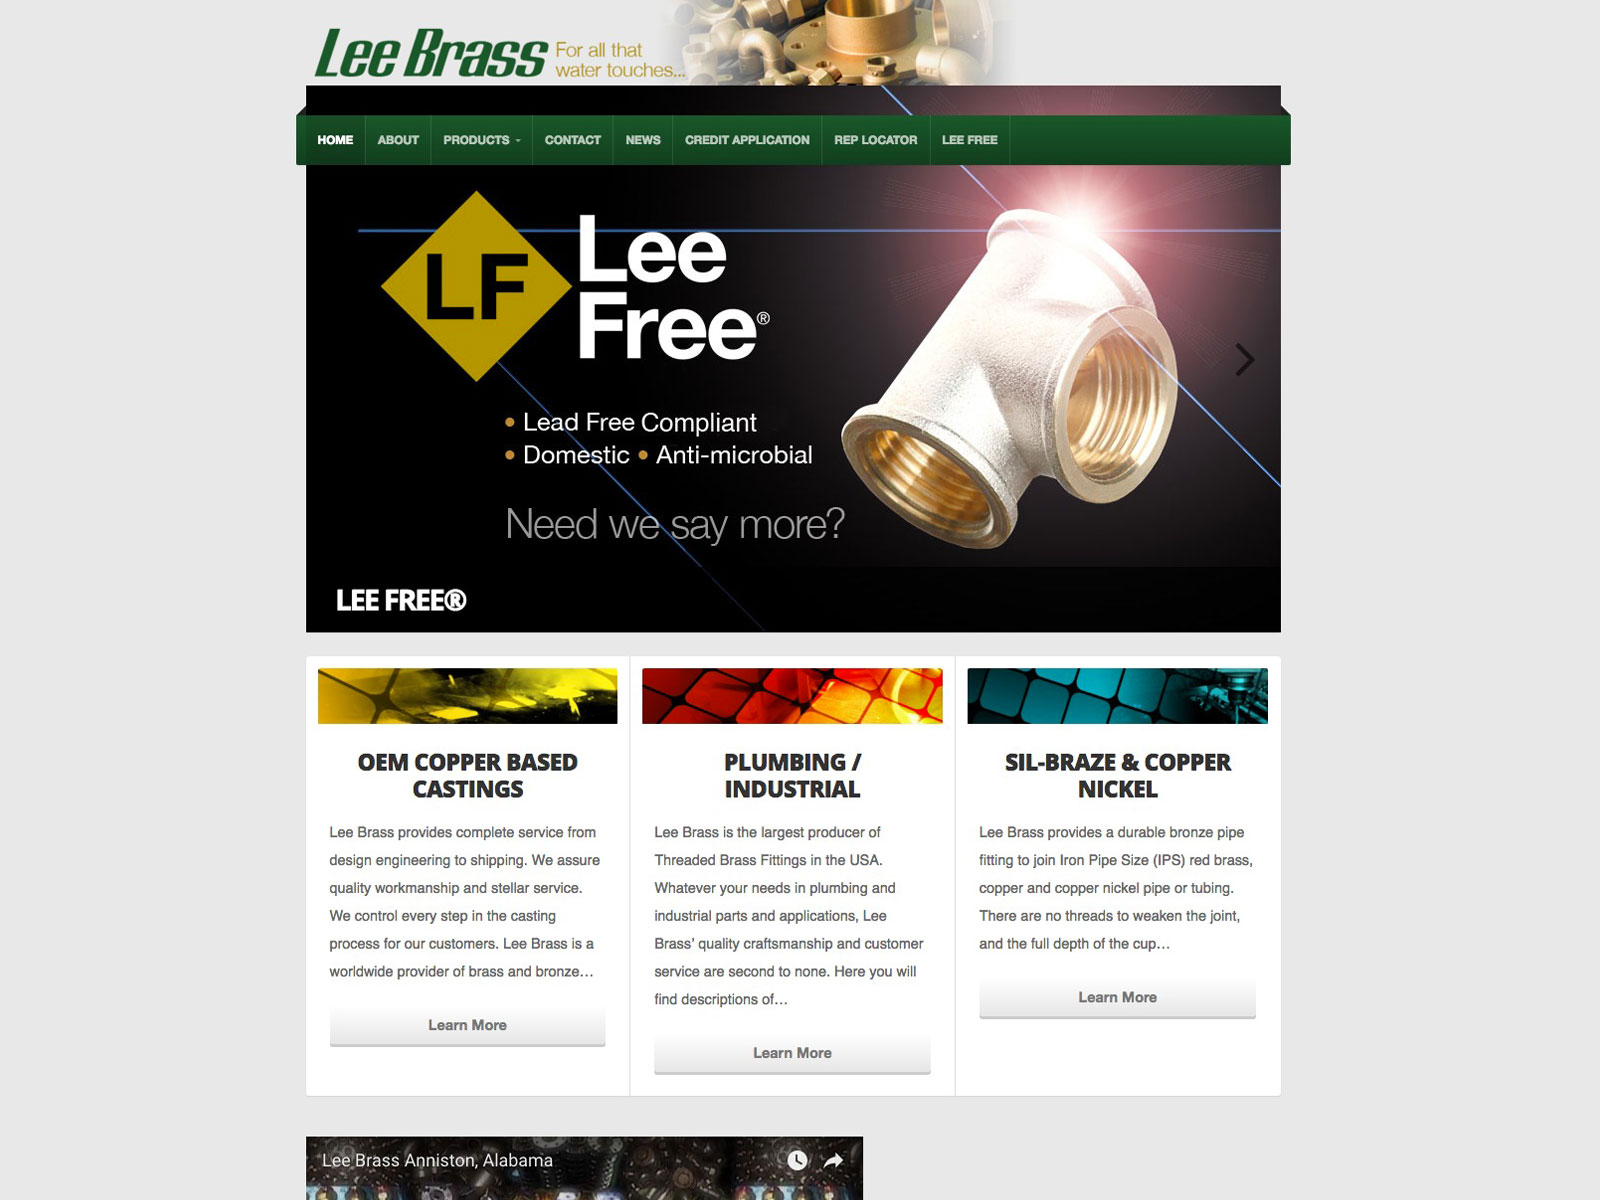 leebrass.com